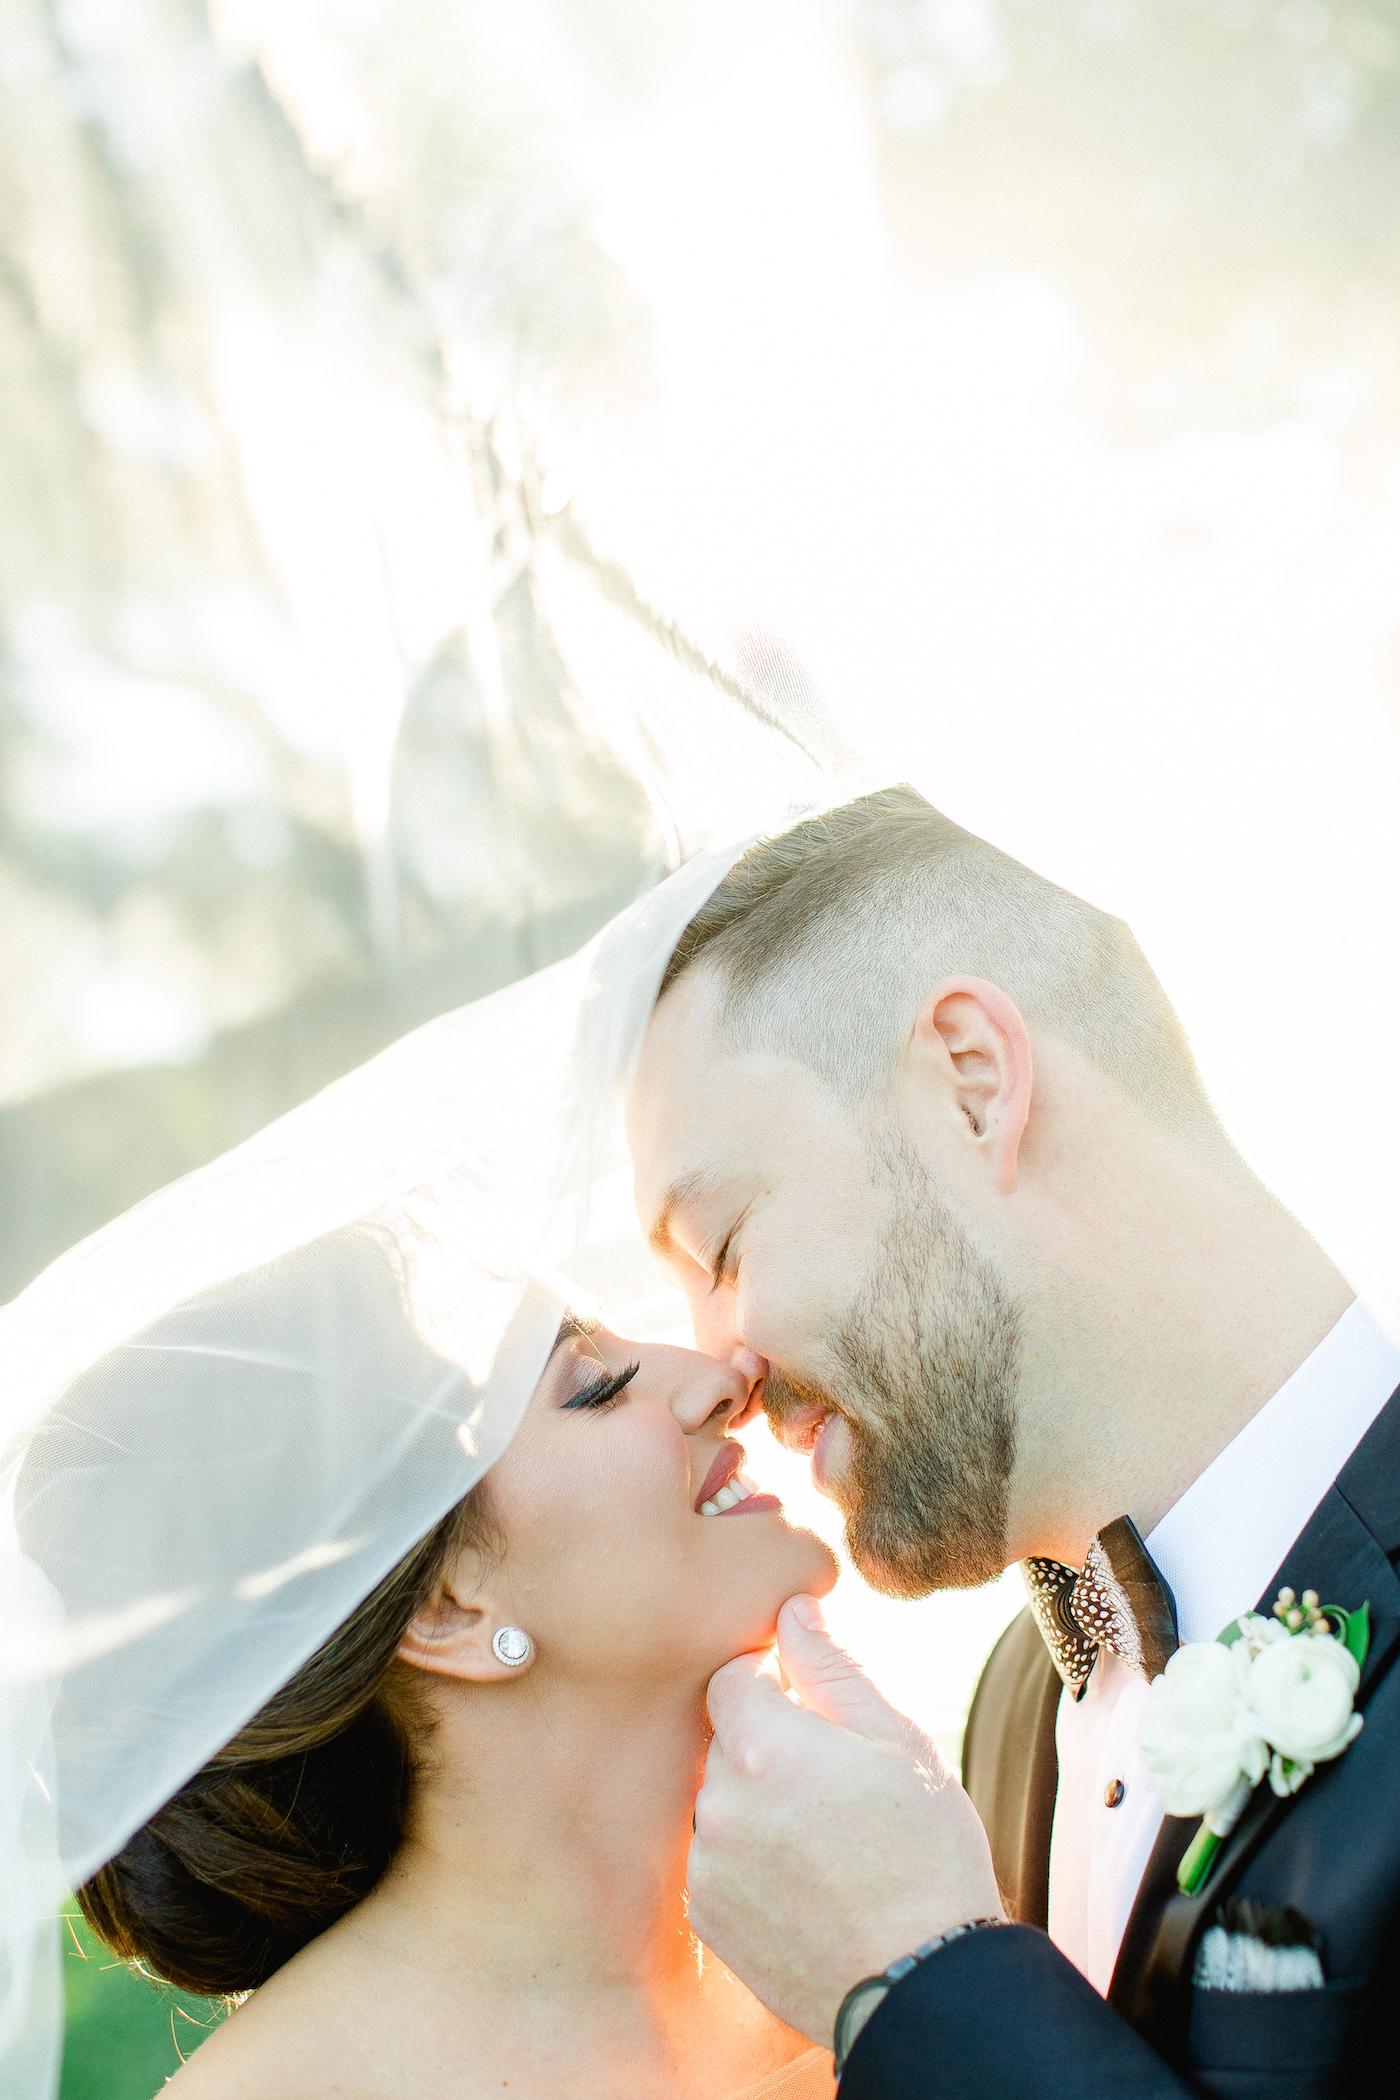 Classic Florida Bride and Groom Wedding Portrait, Intimate Kiss under Bridal Veil